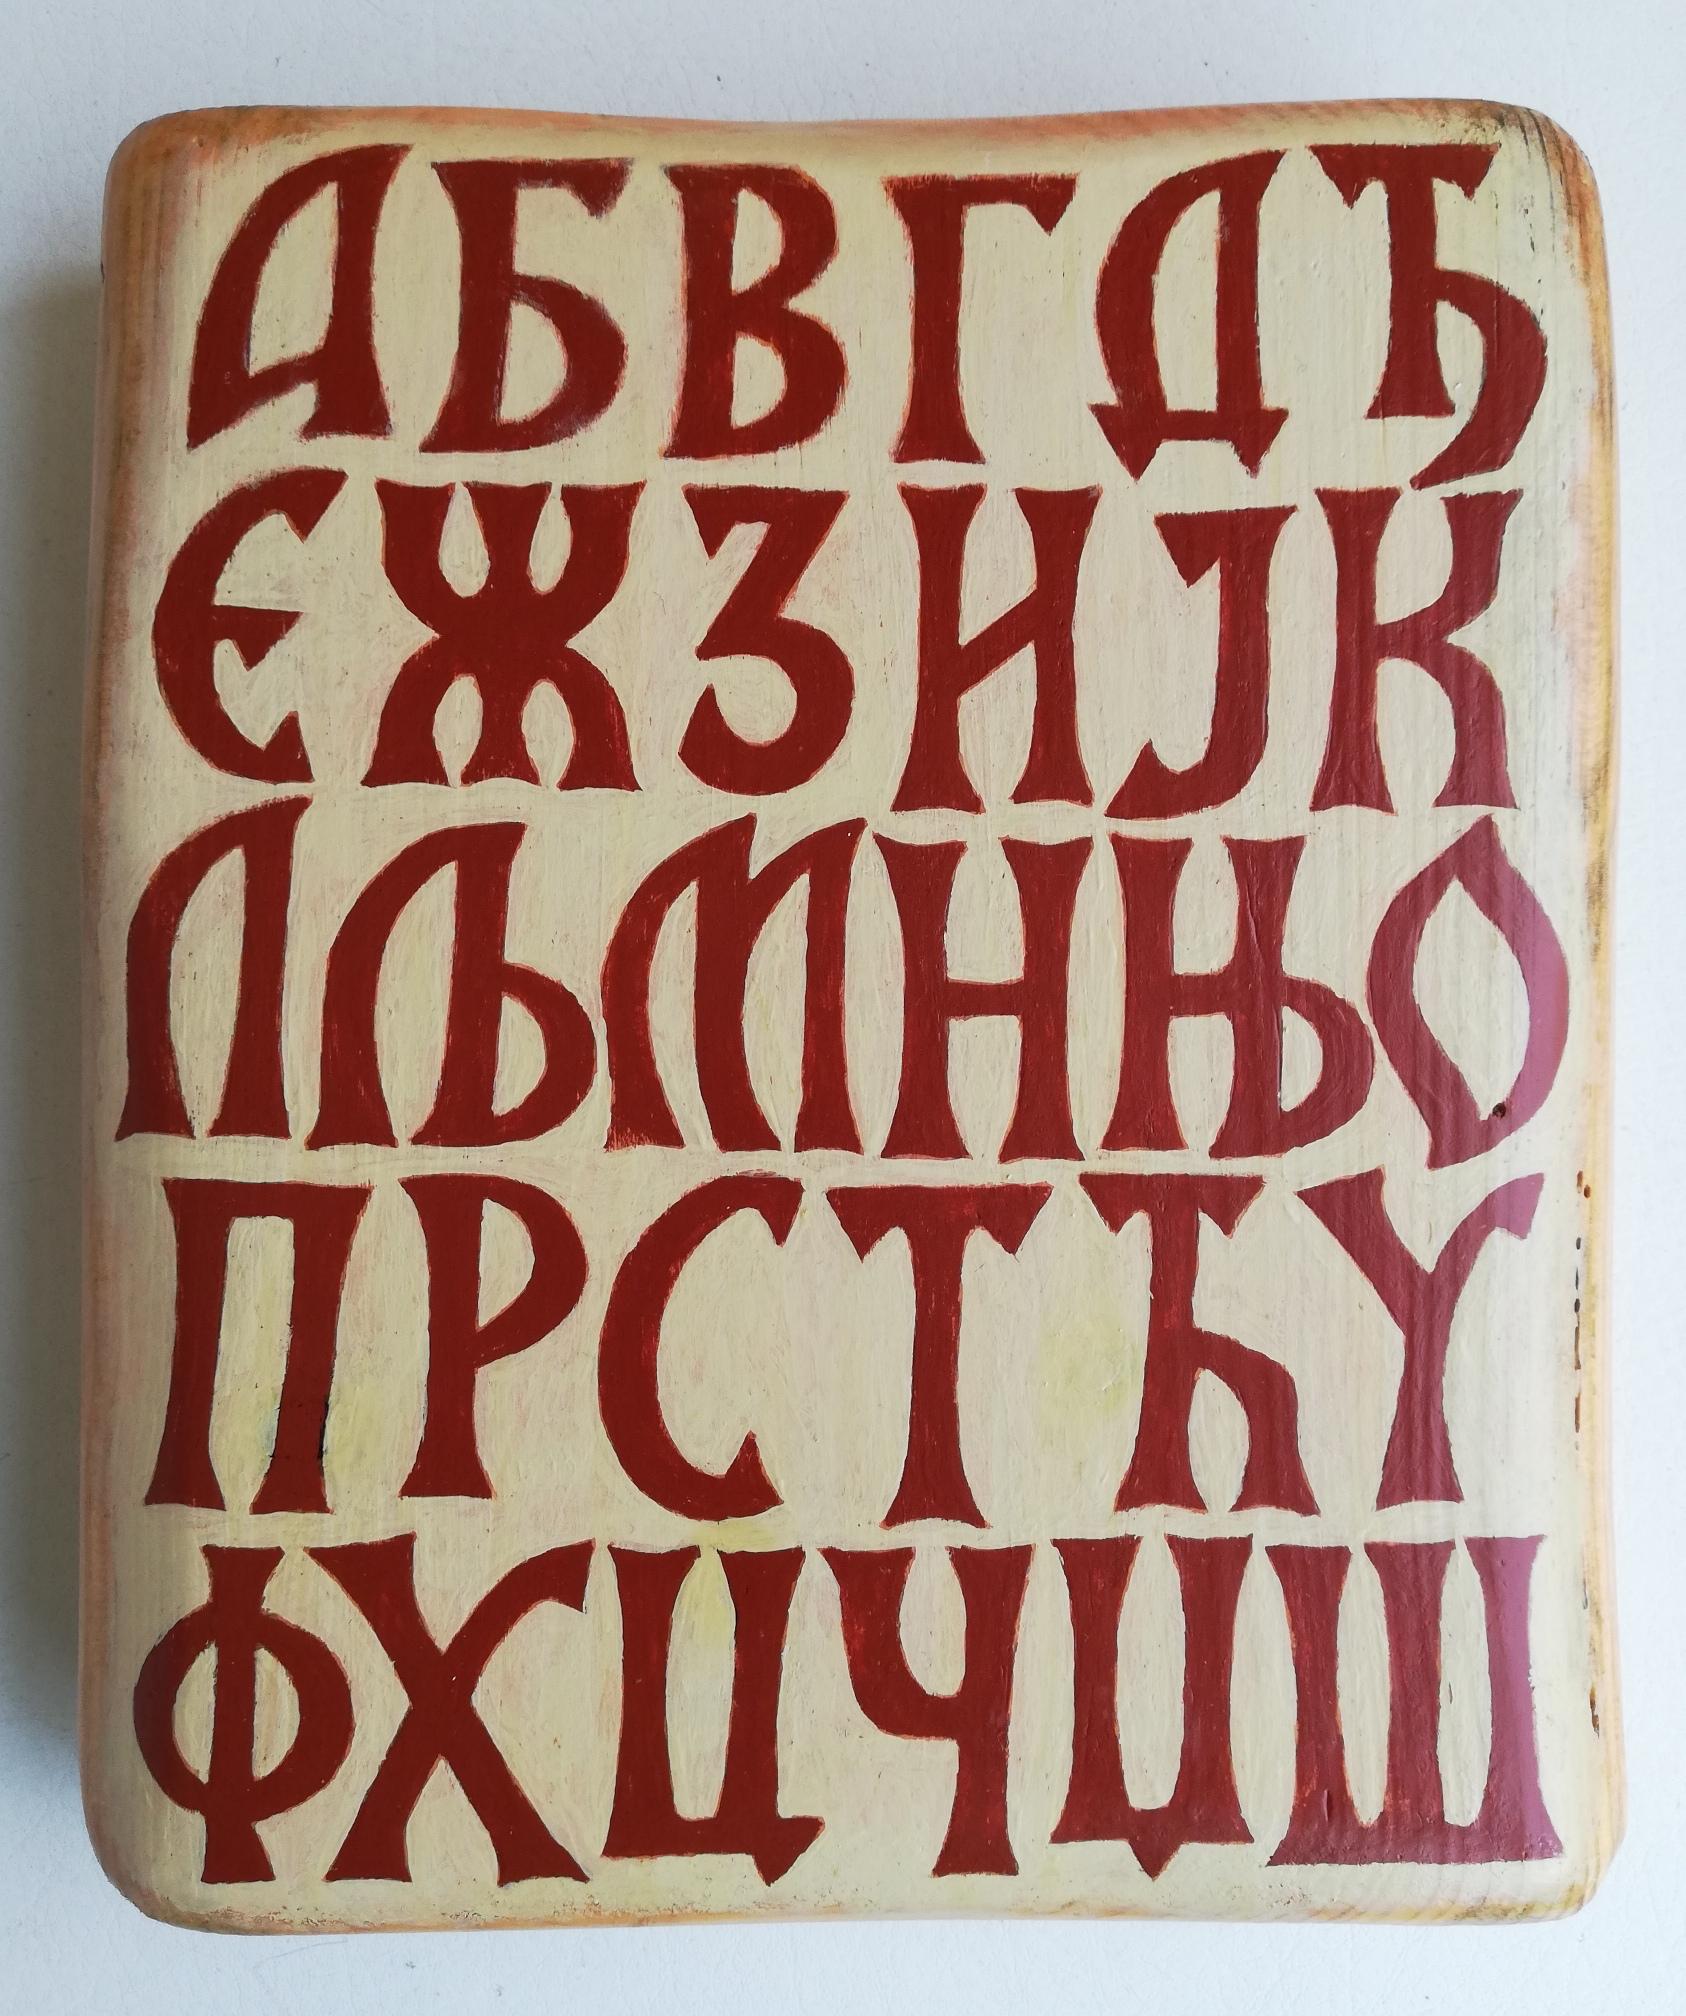 KYRILLISCHES ALPHABET 13 / AZBUKA 13